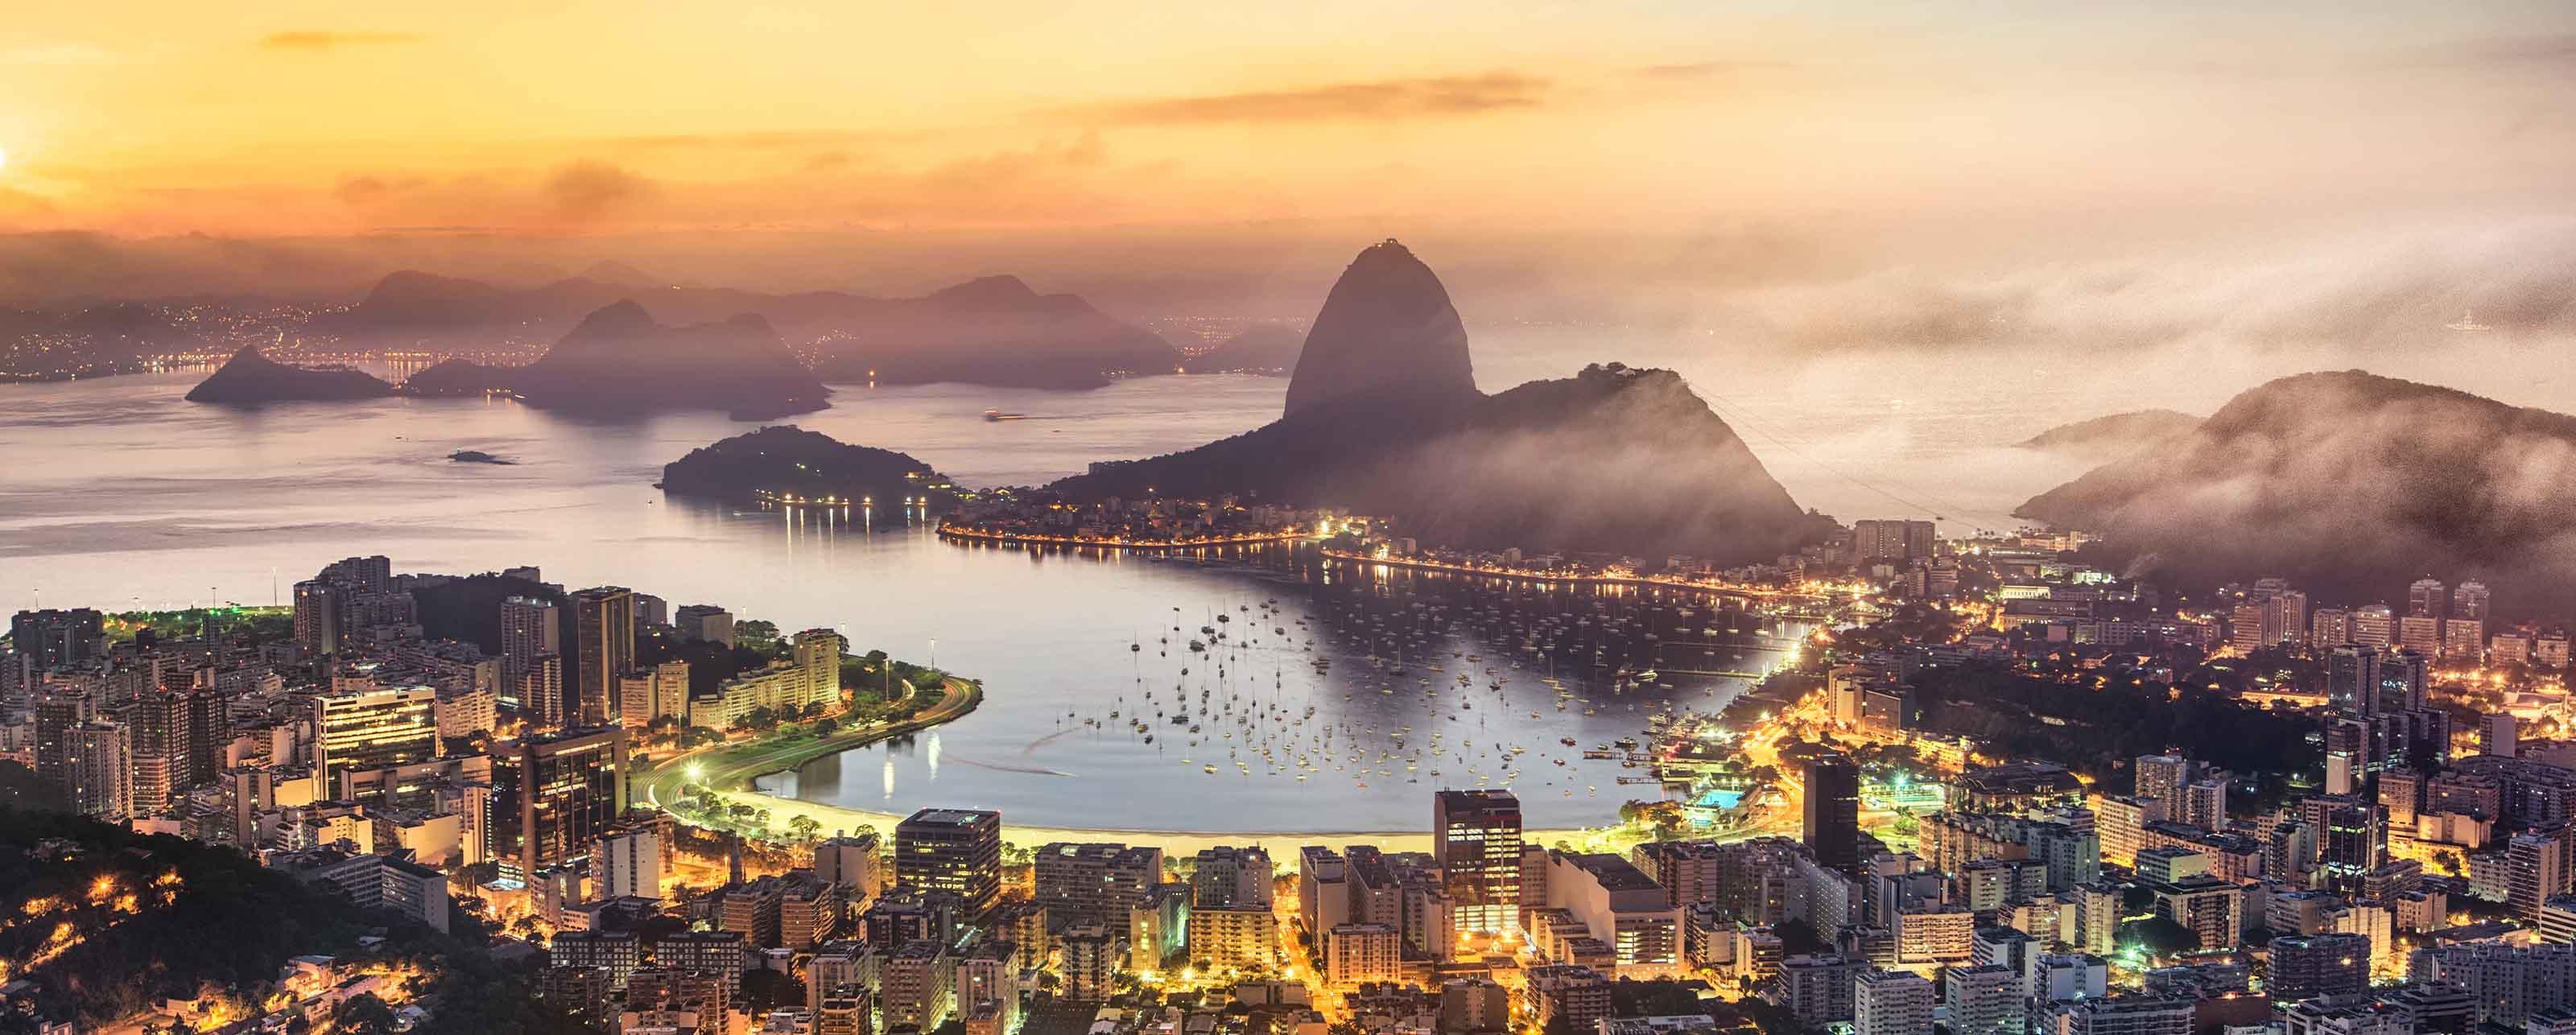 GE Telecommunications for Power Utilities: Brazil customer story